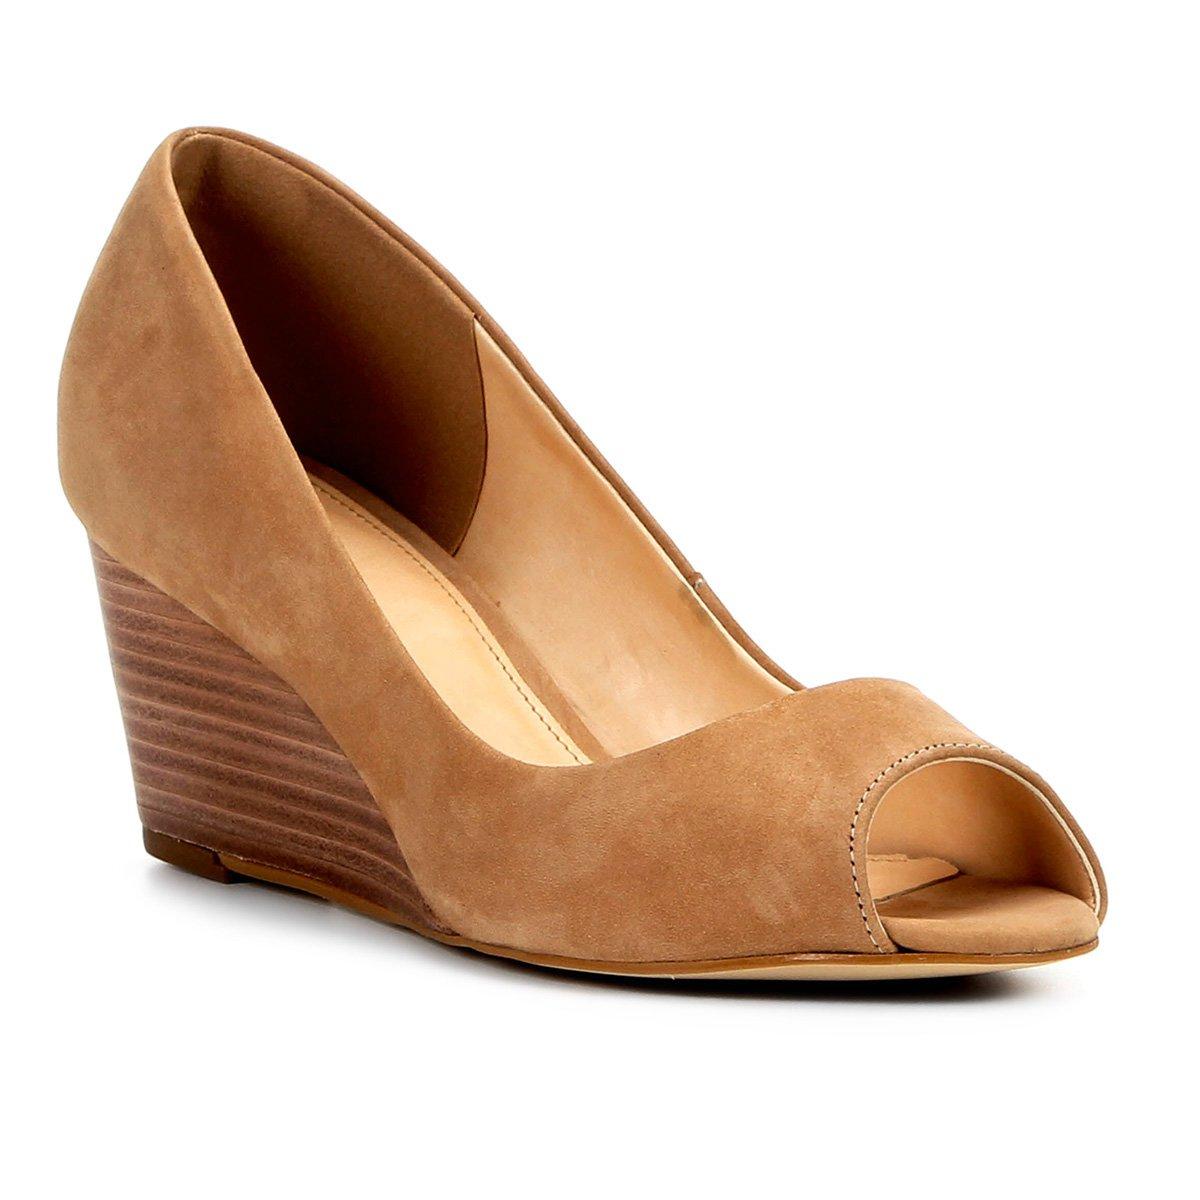 82925758f5b Peep Toe Couro Shoestock Anabela Básico Fachete - Marrom Claro - Compre  Agora